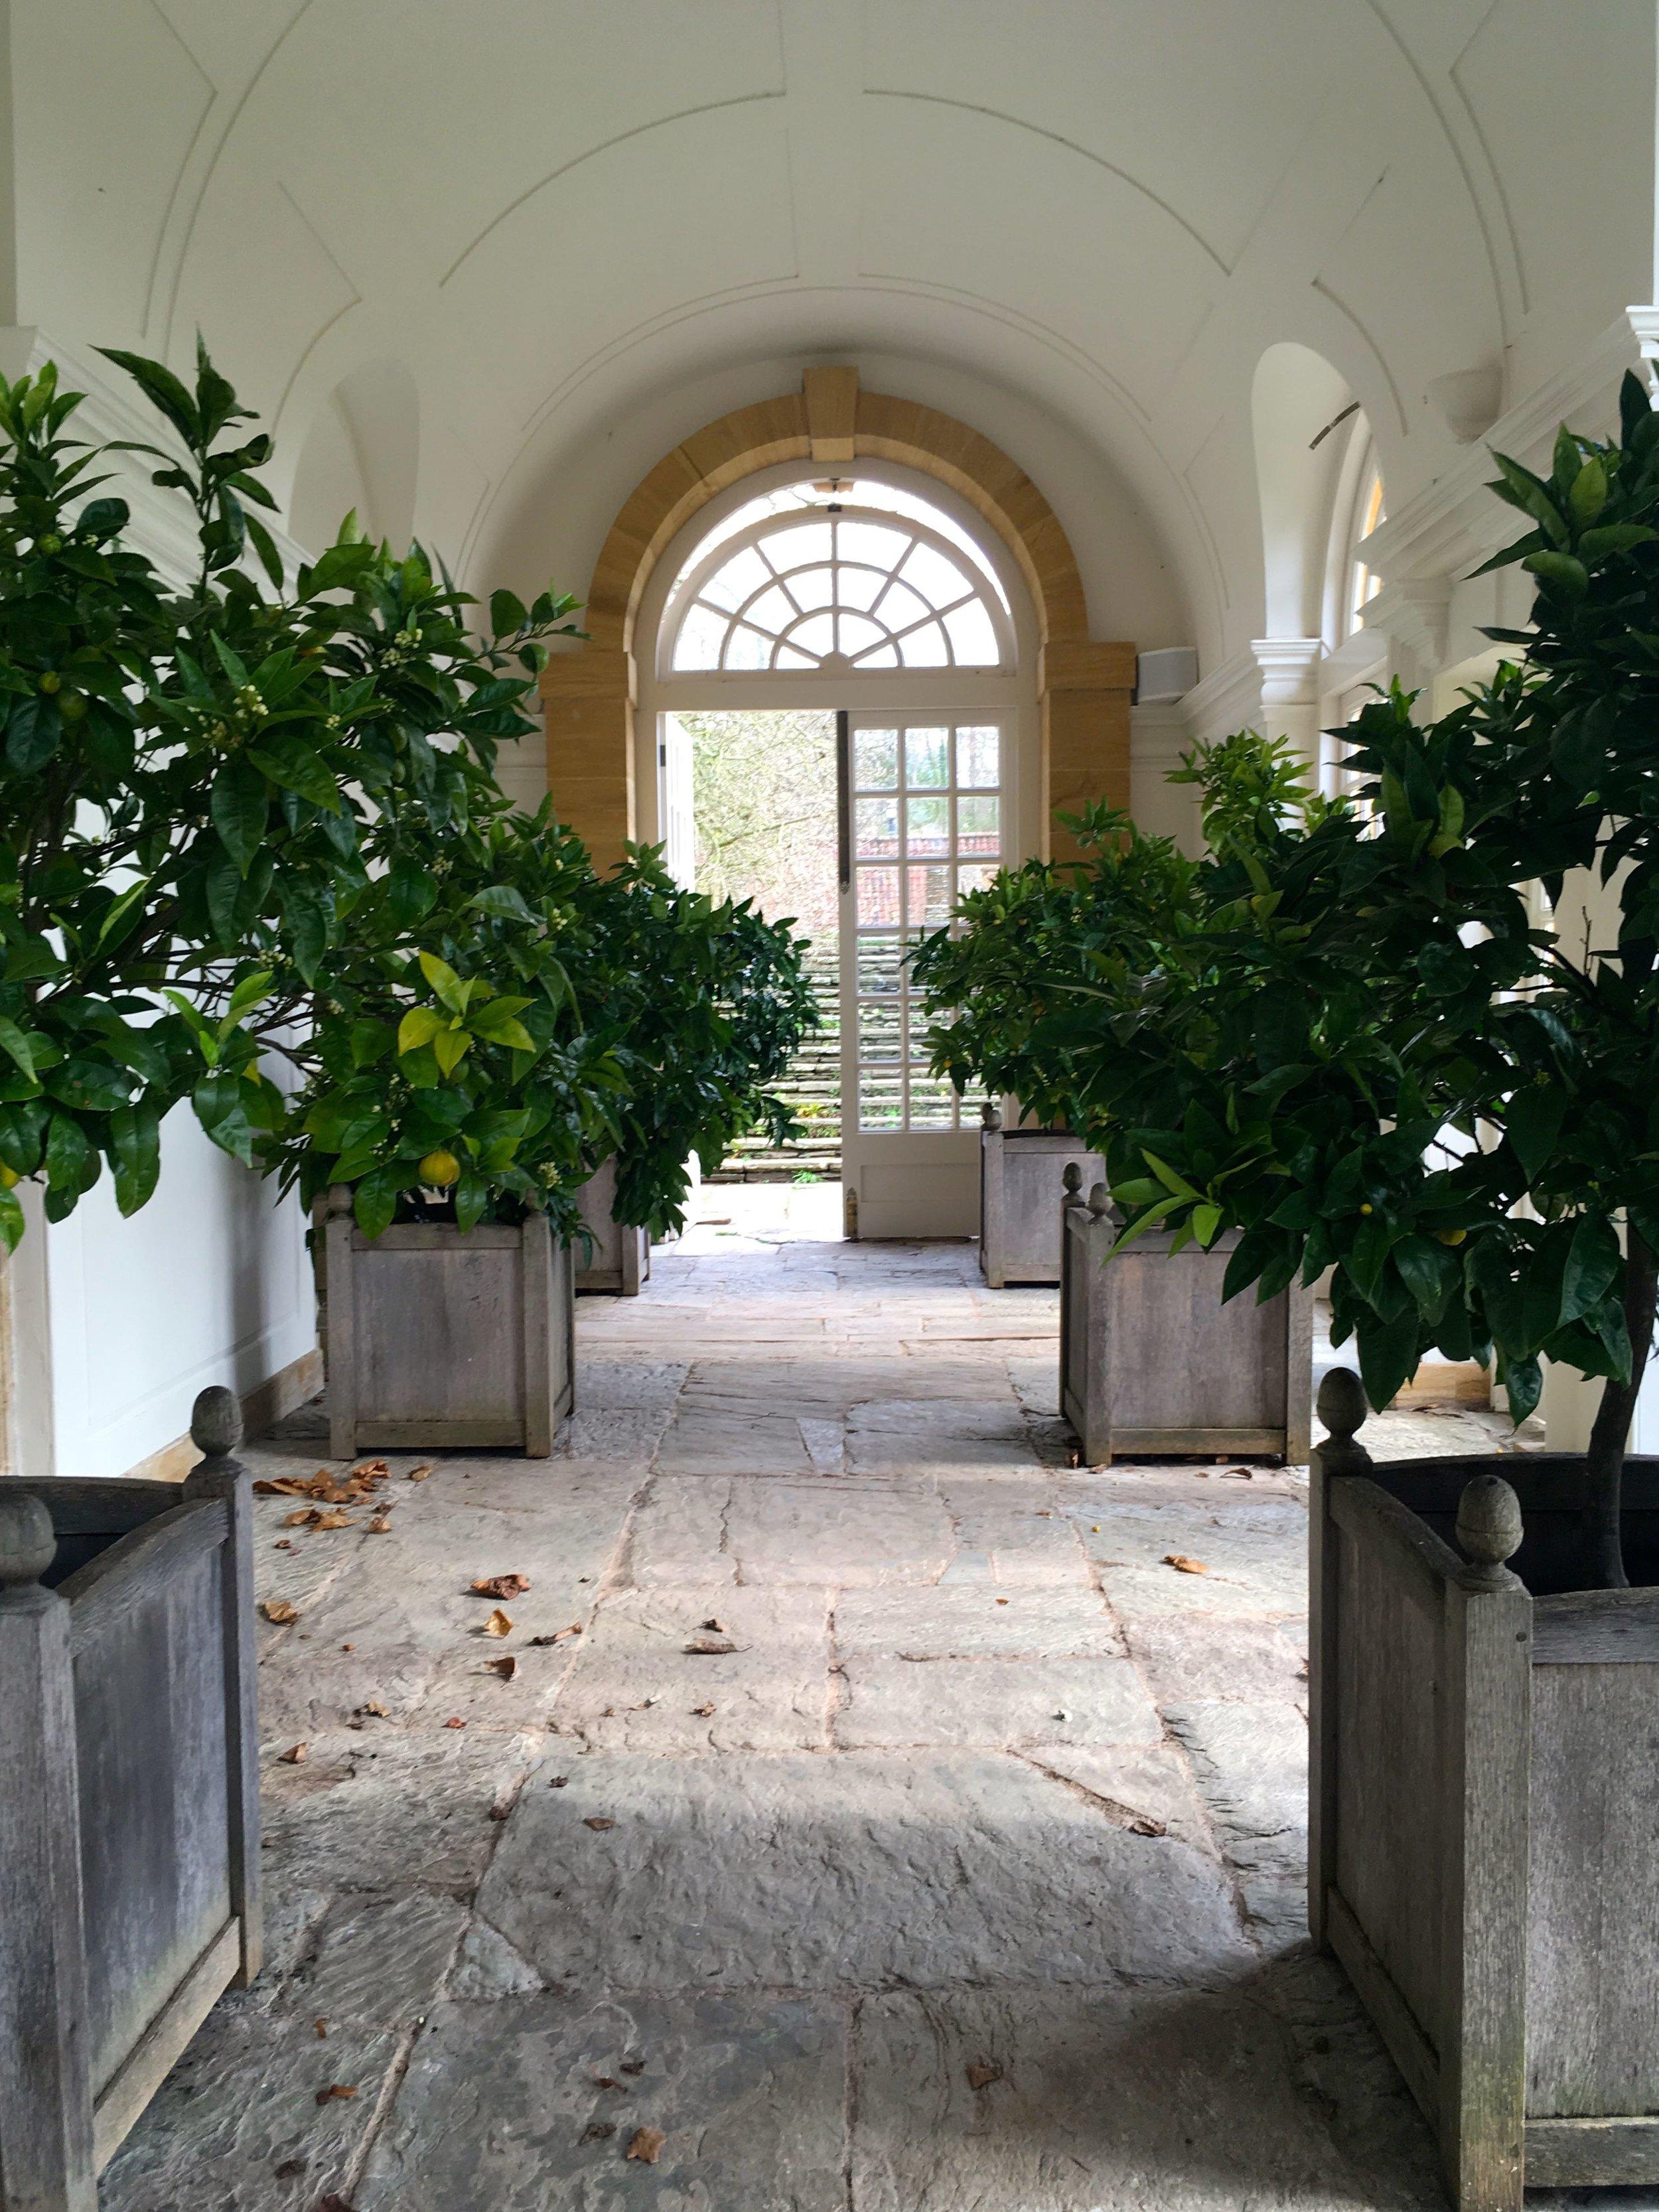 Inside the fabulous Orangery at Hestercombe